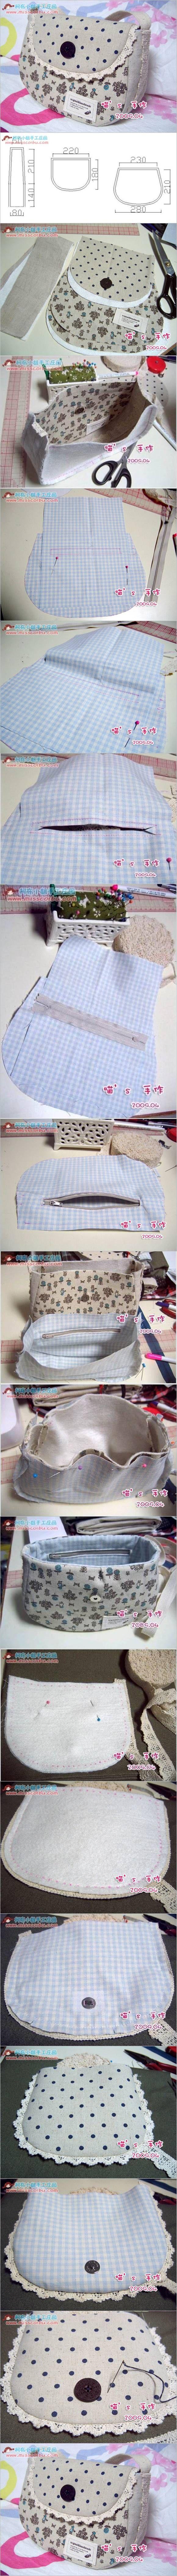 DIY How to Sew a Simple Summer Handbag